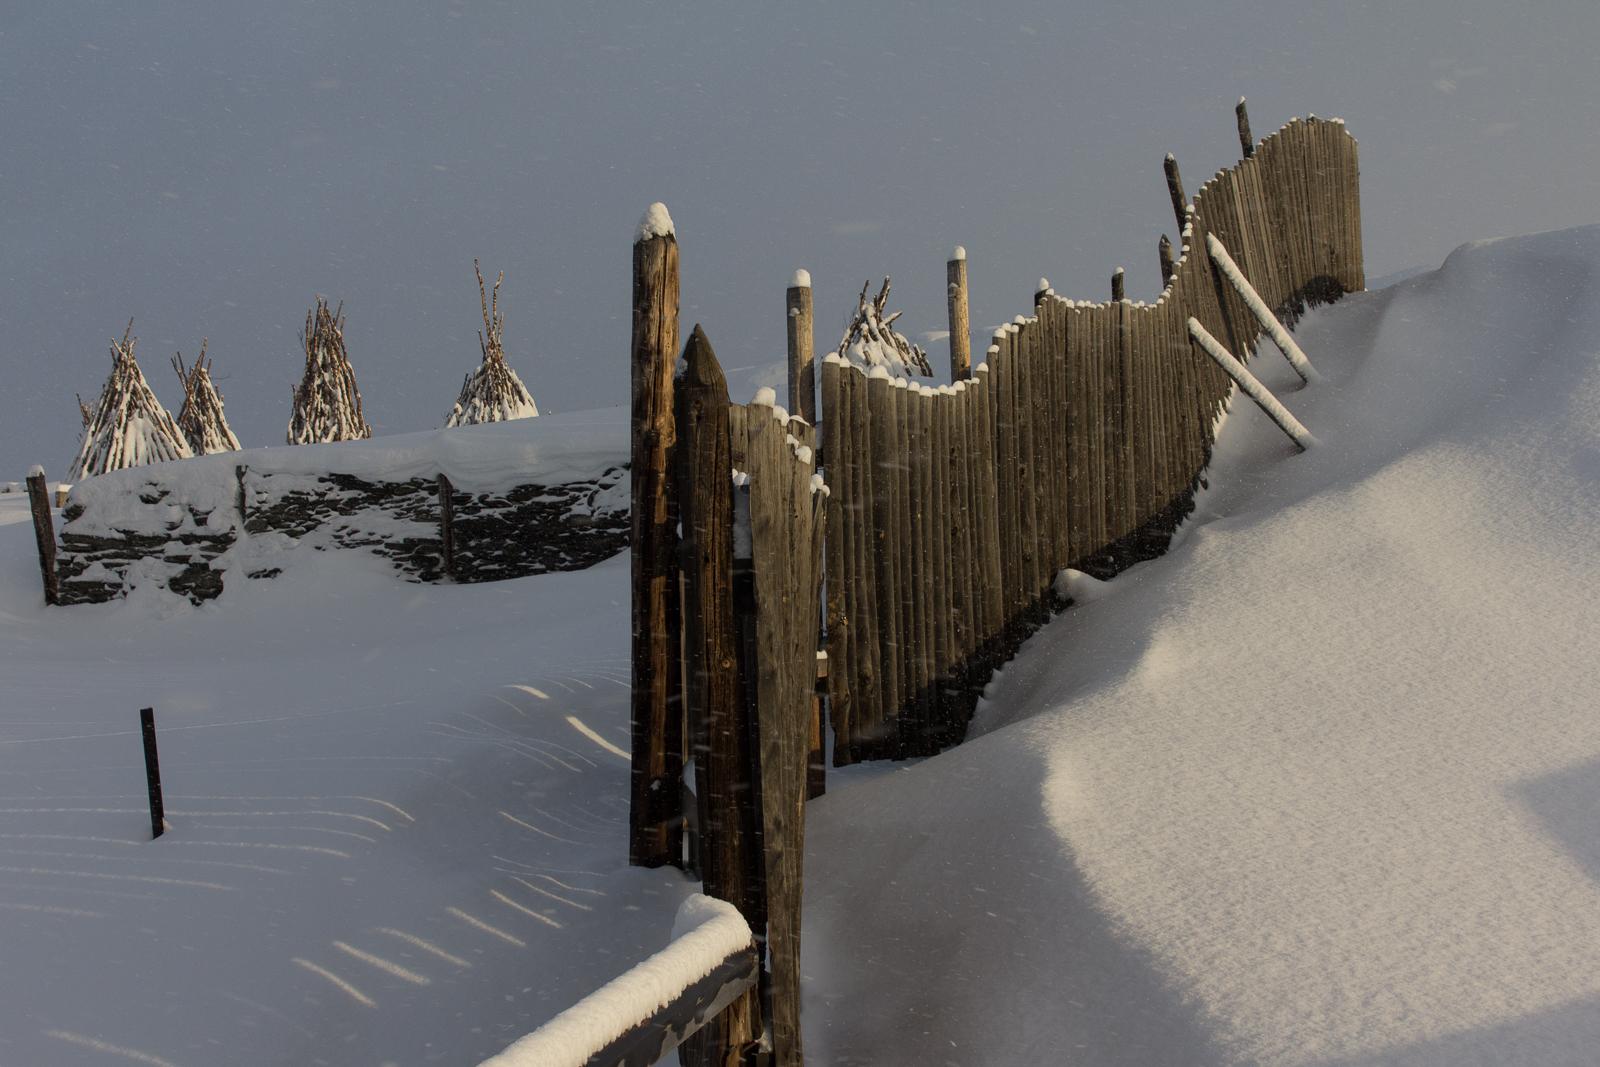 Røros Winter (fences)